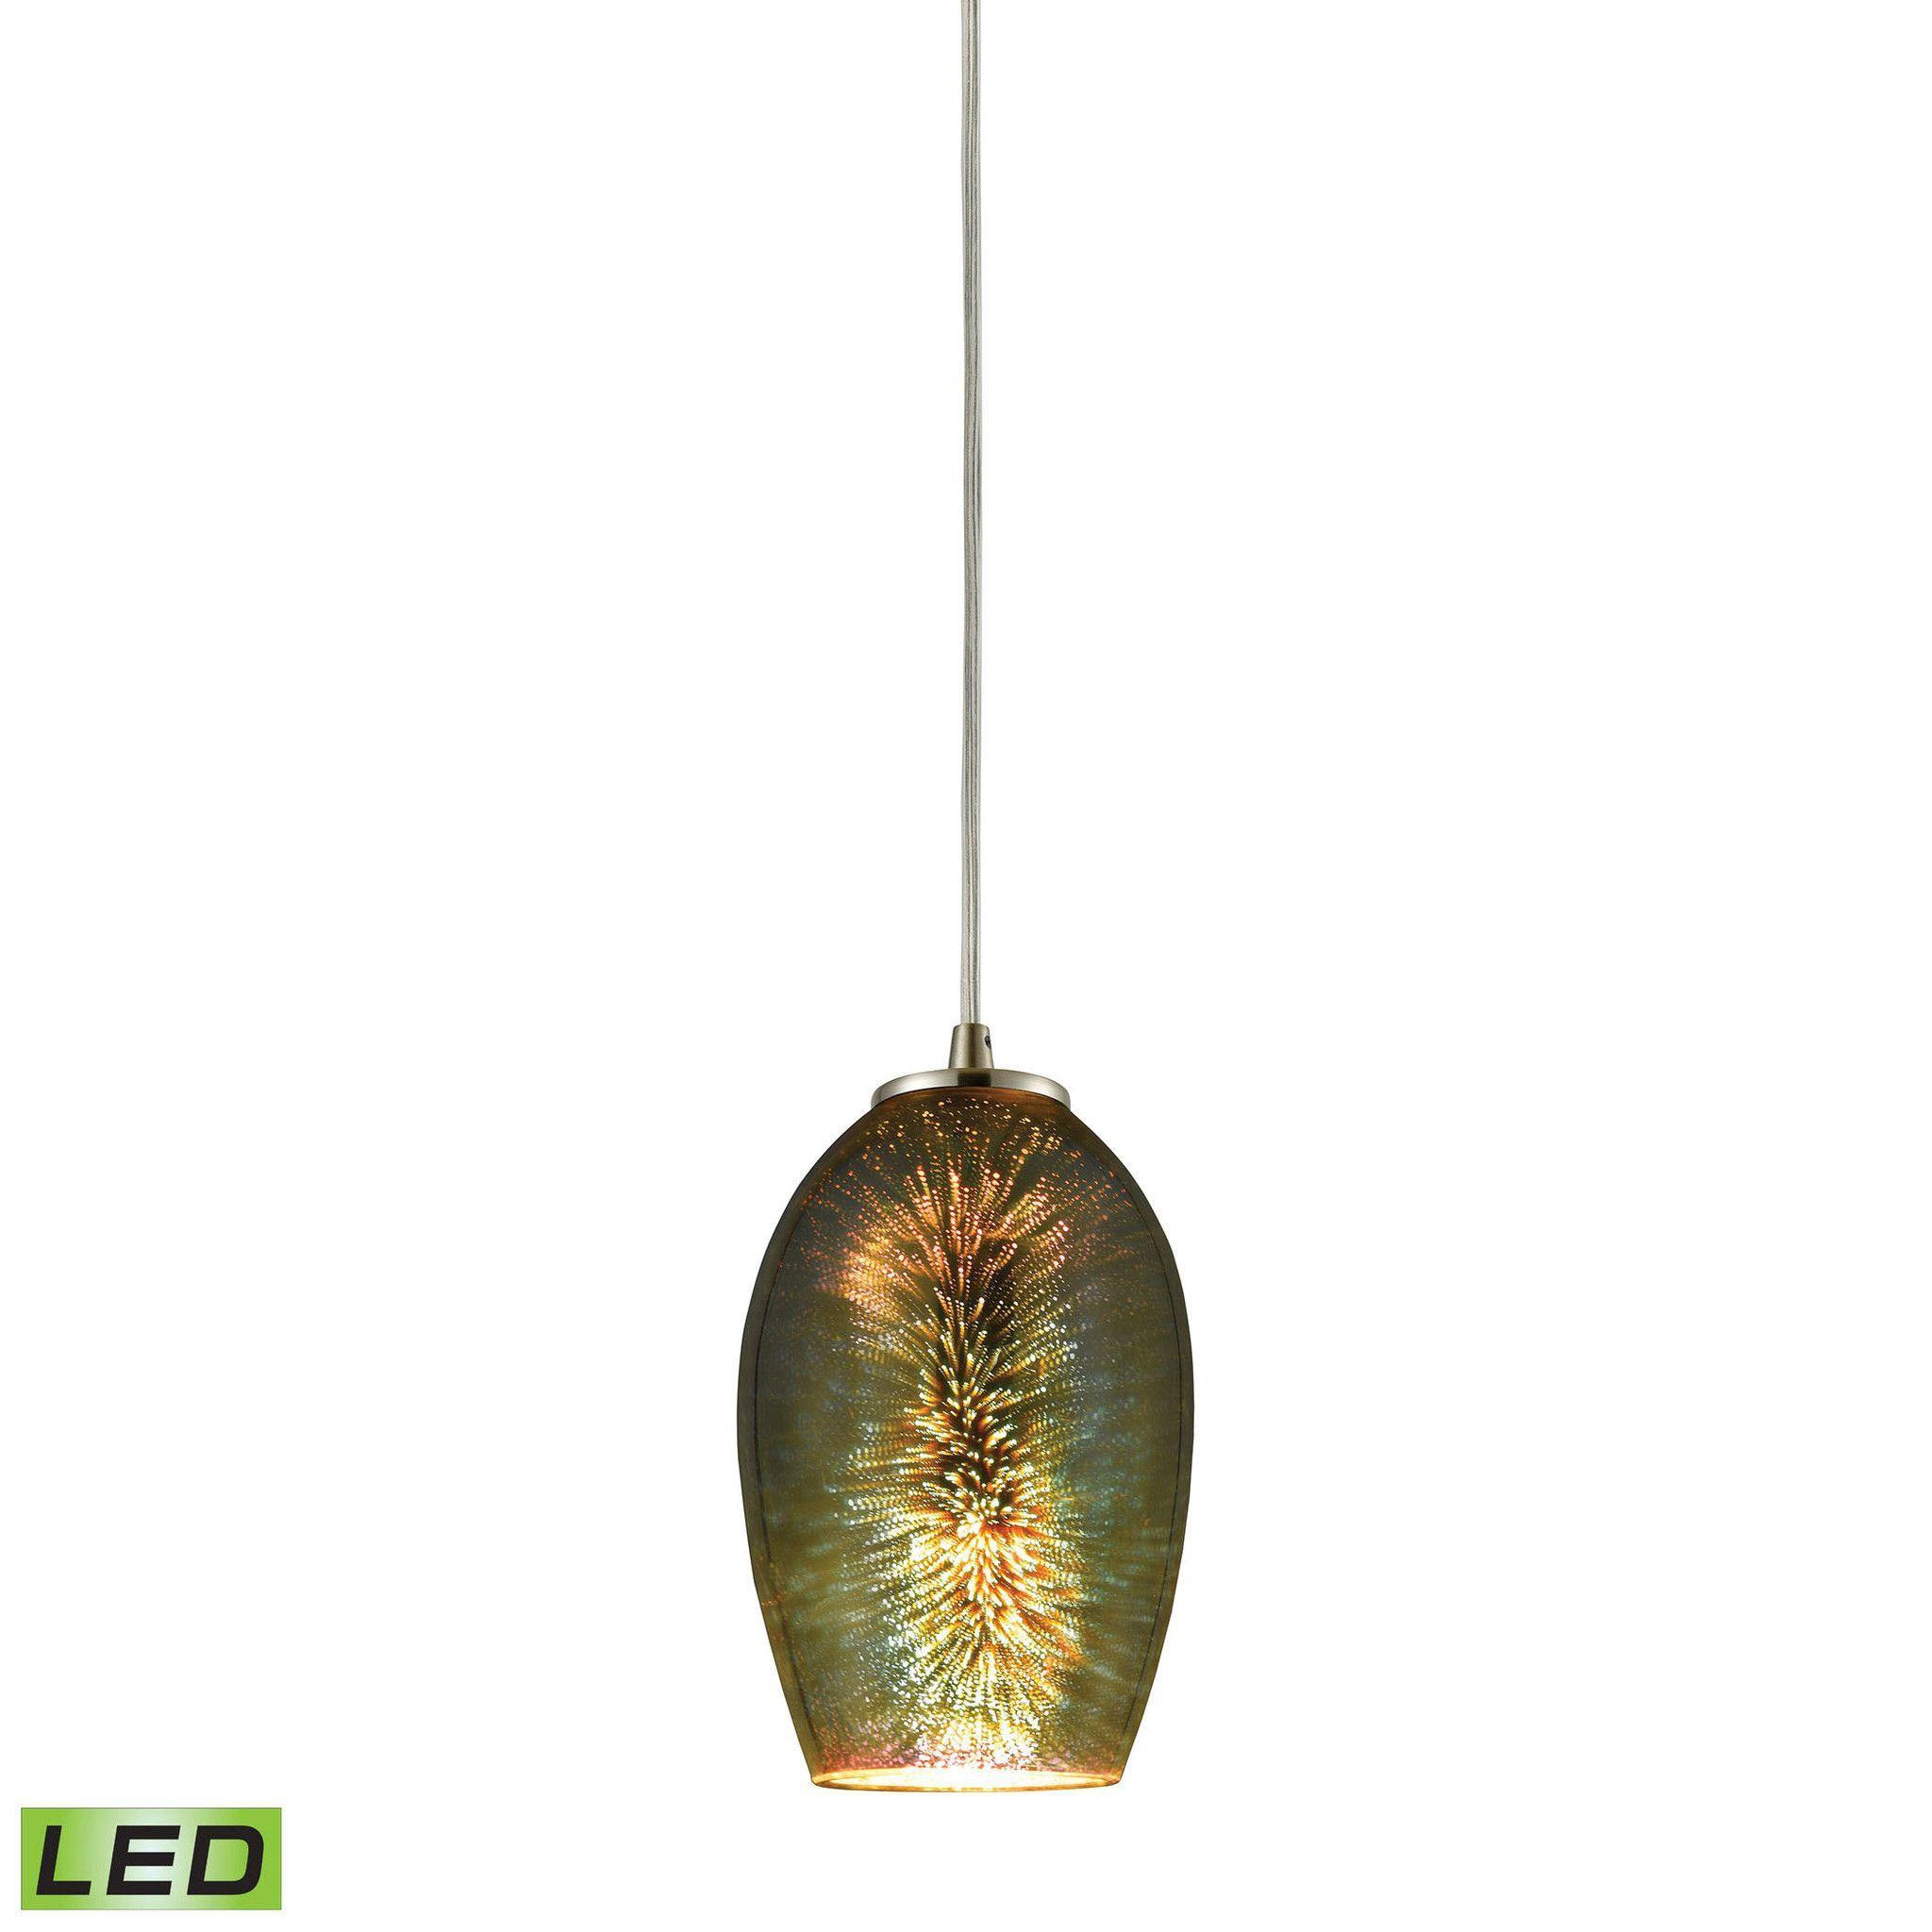 ELK Lighting 10506/1-LED Illusions Collection Satin Nickel Finish